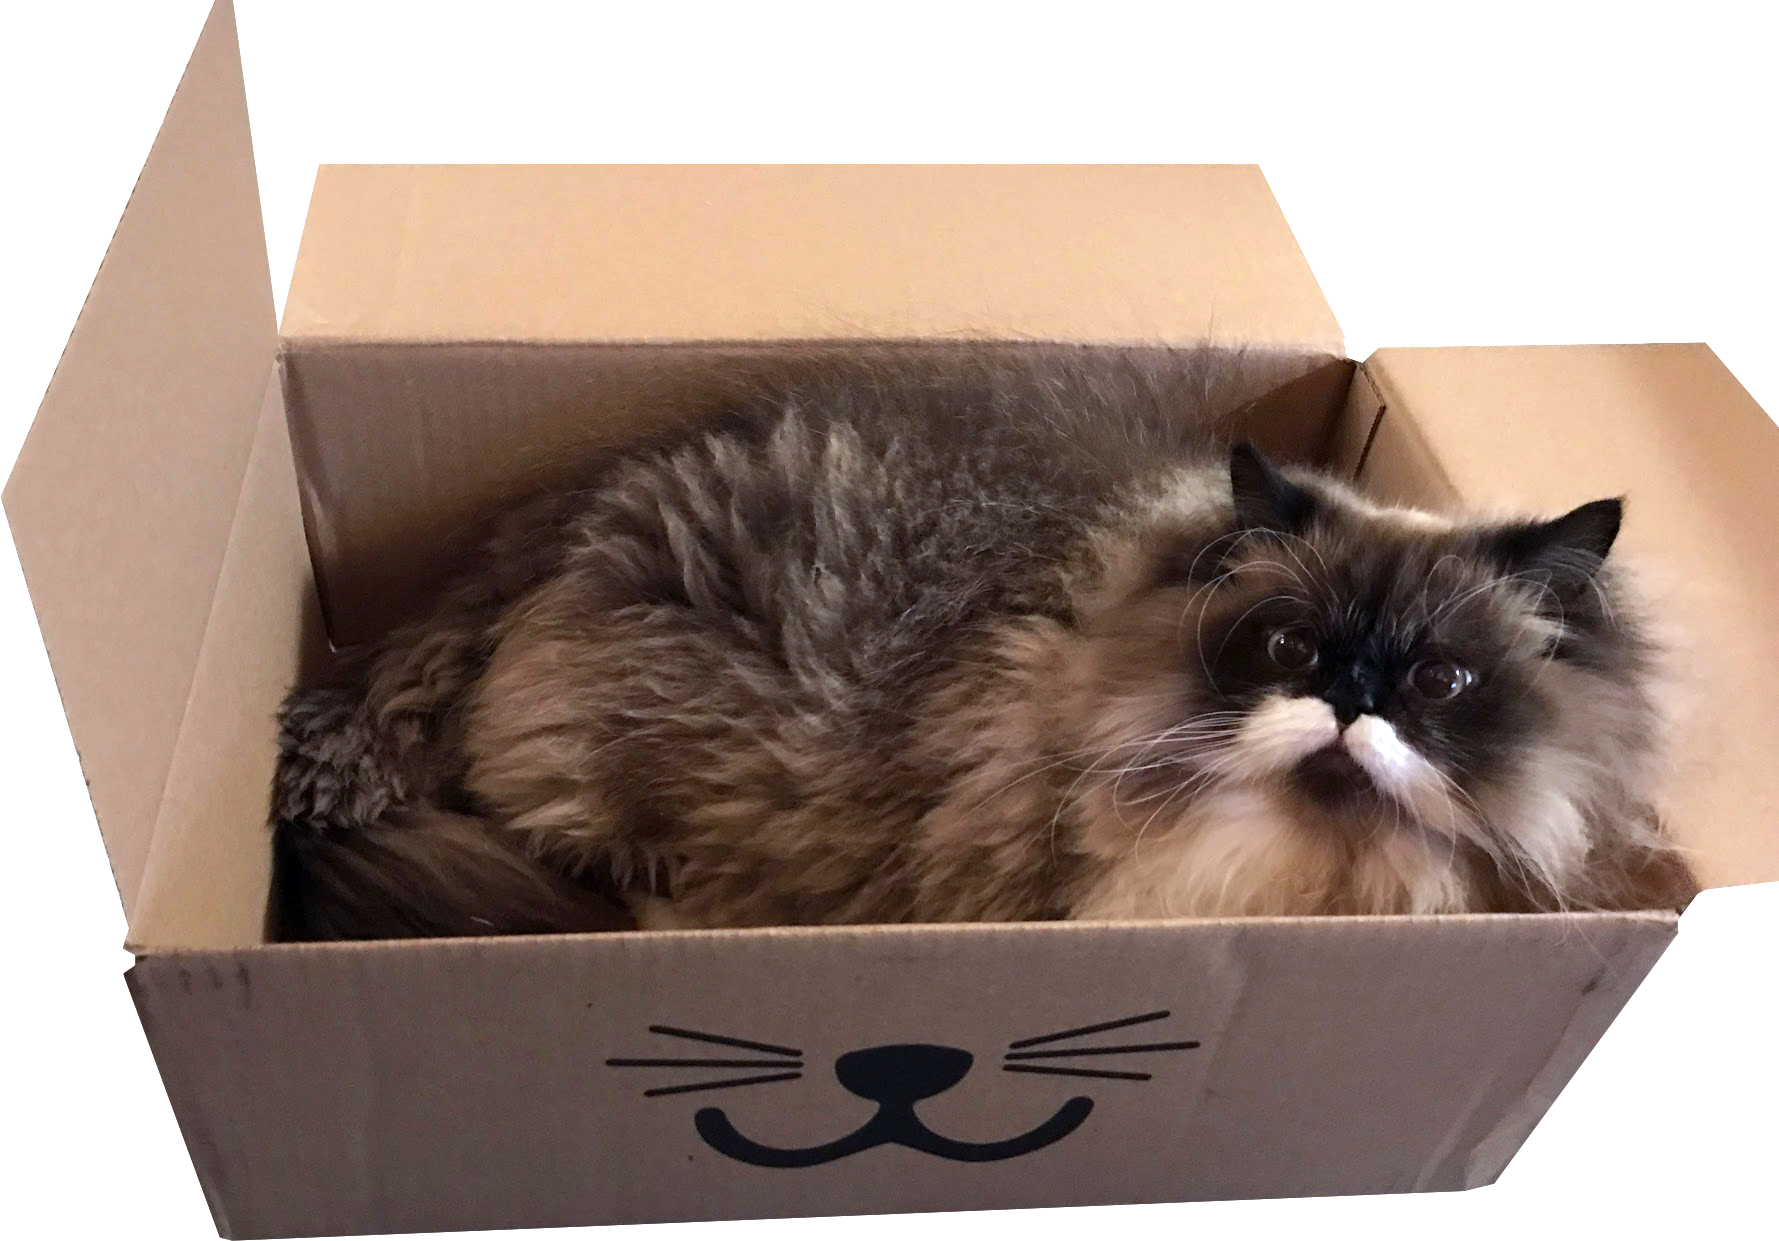 frank box cropped.jpg